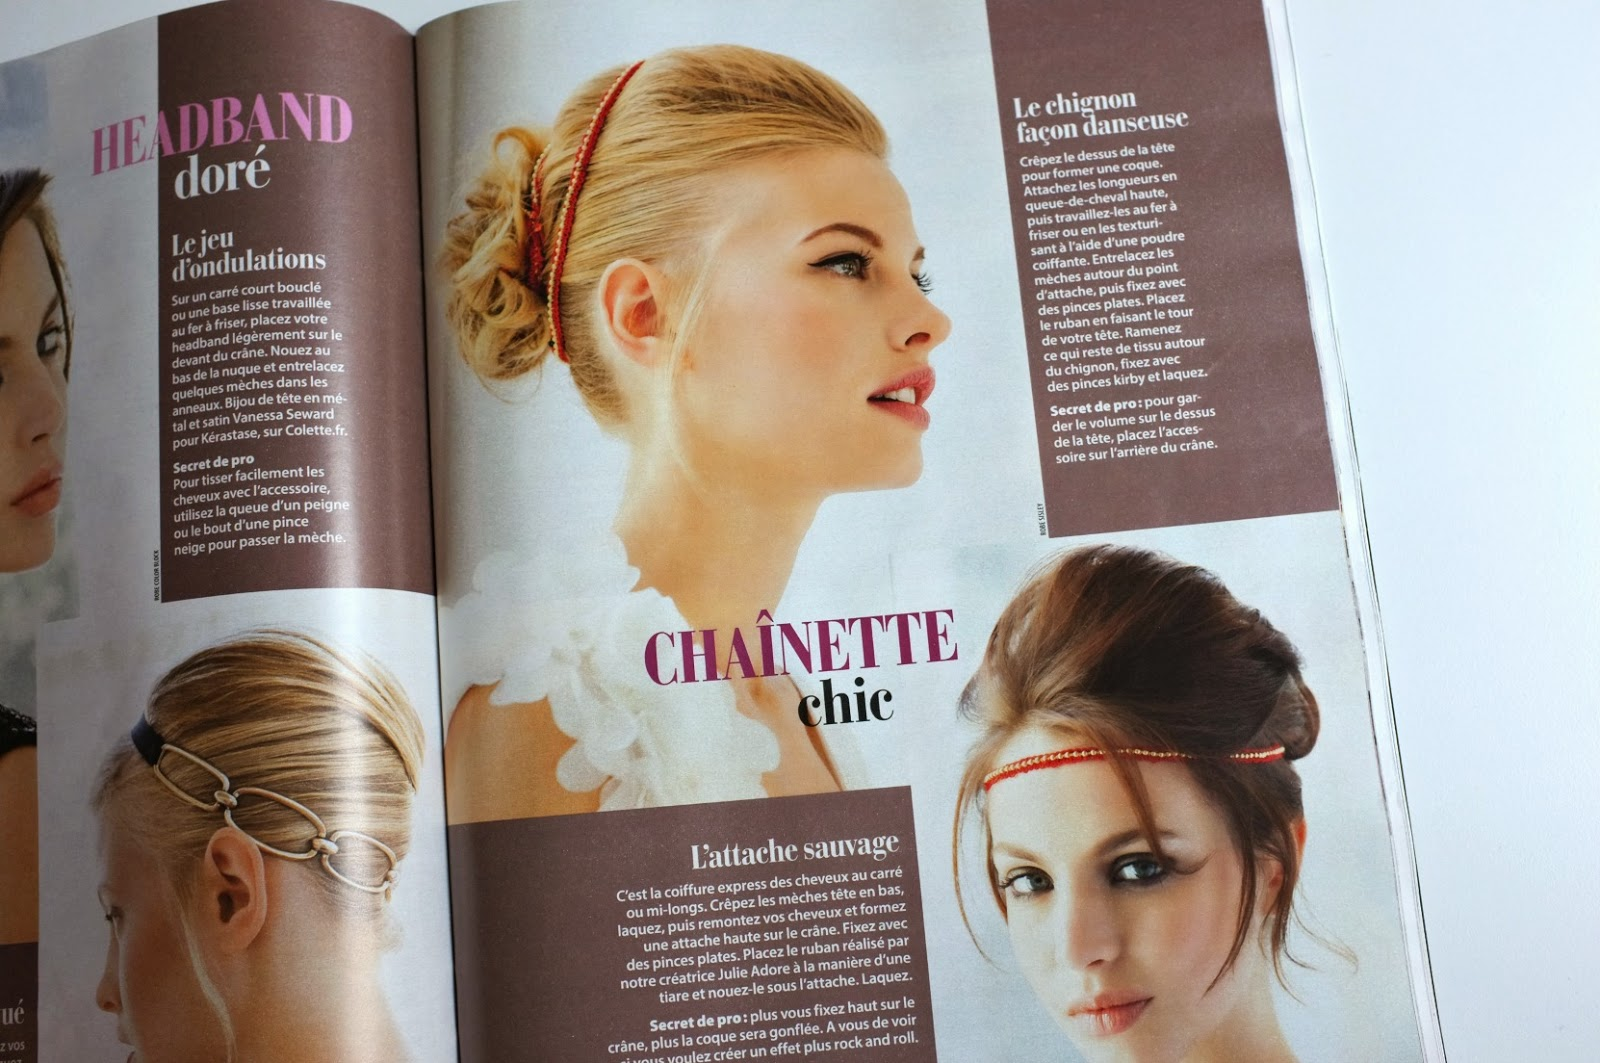 http://www.prima.fr/mode-beaute/tuto-bracelet-wraps-express/7943560/